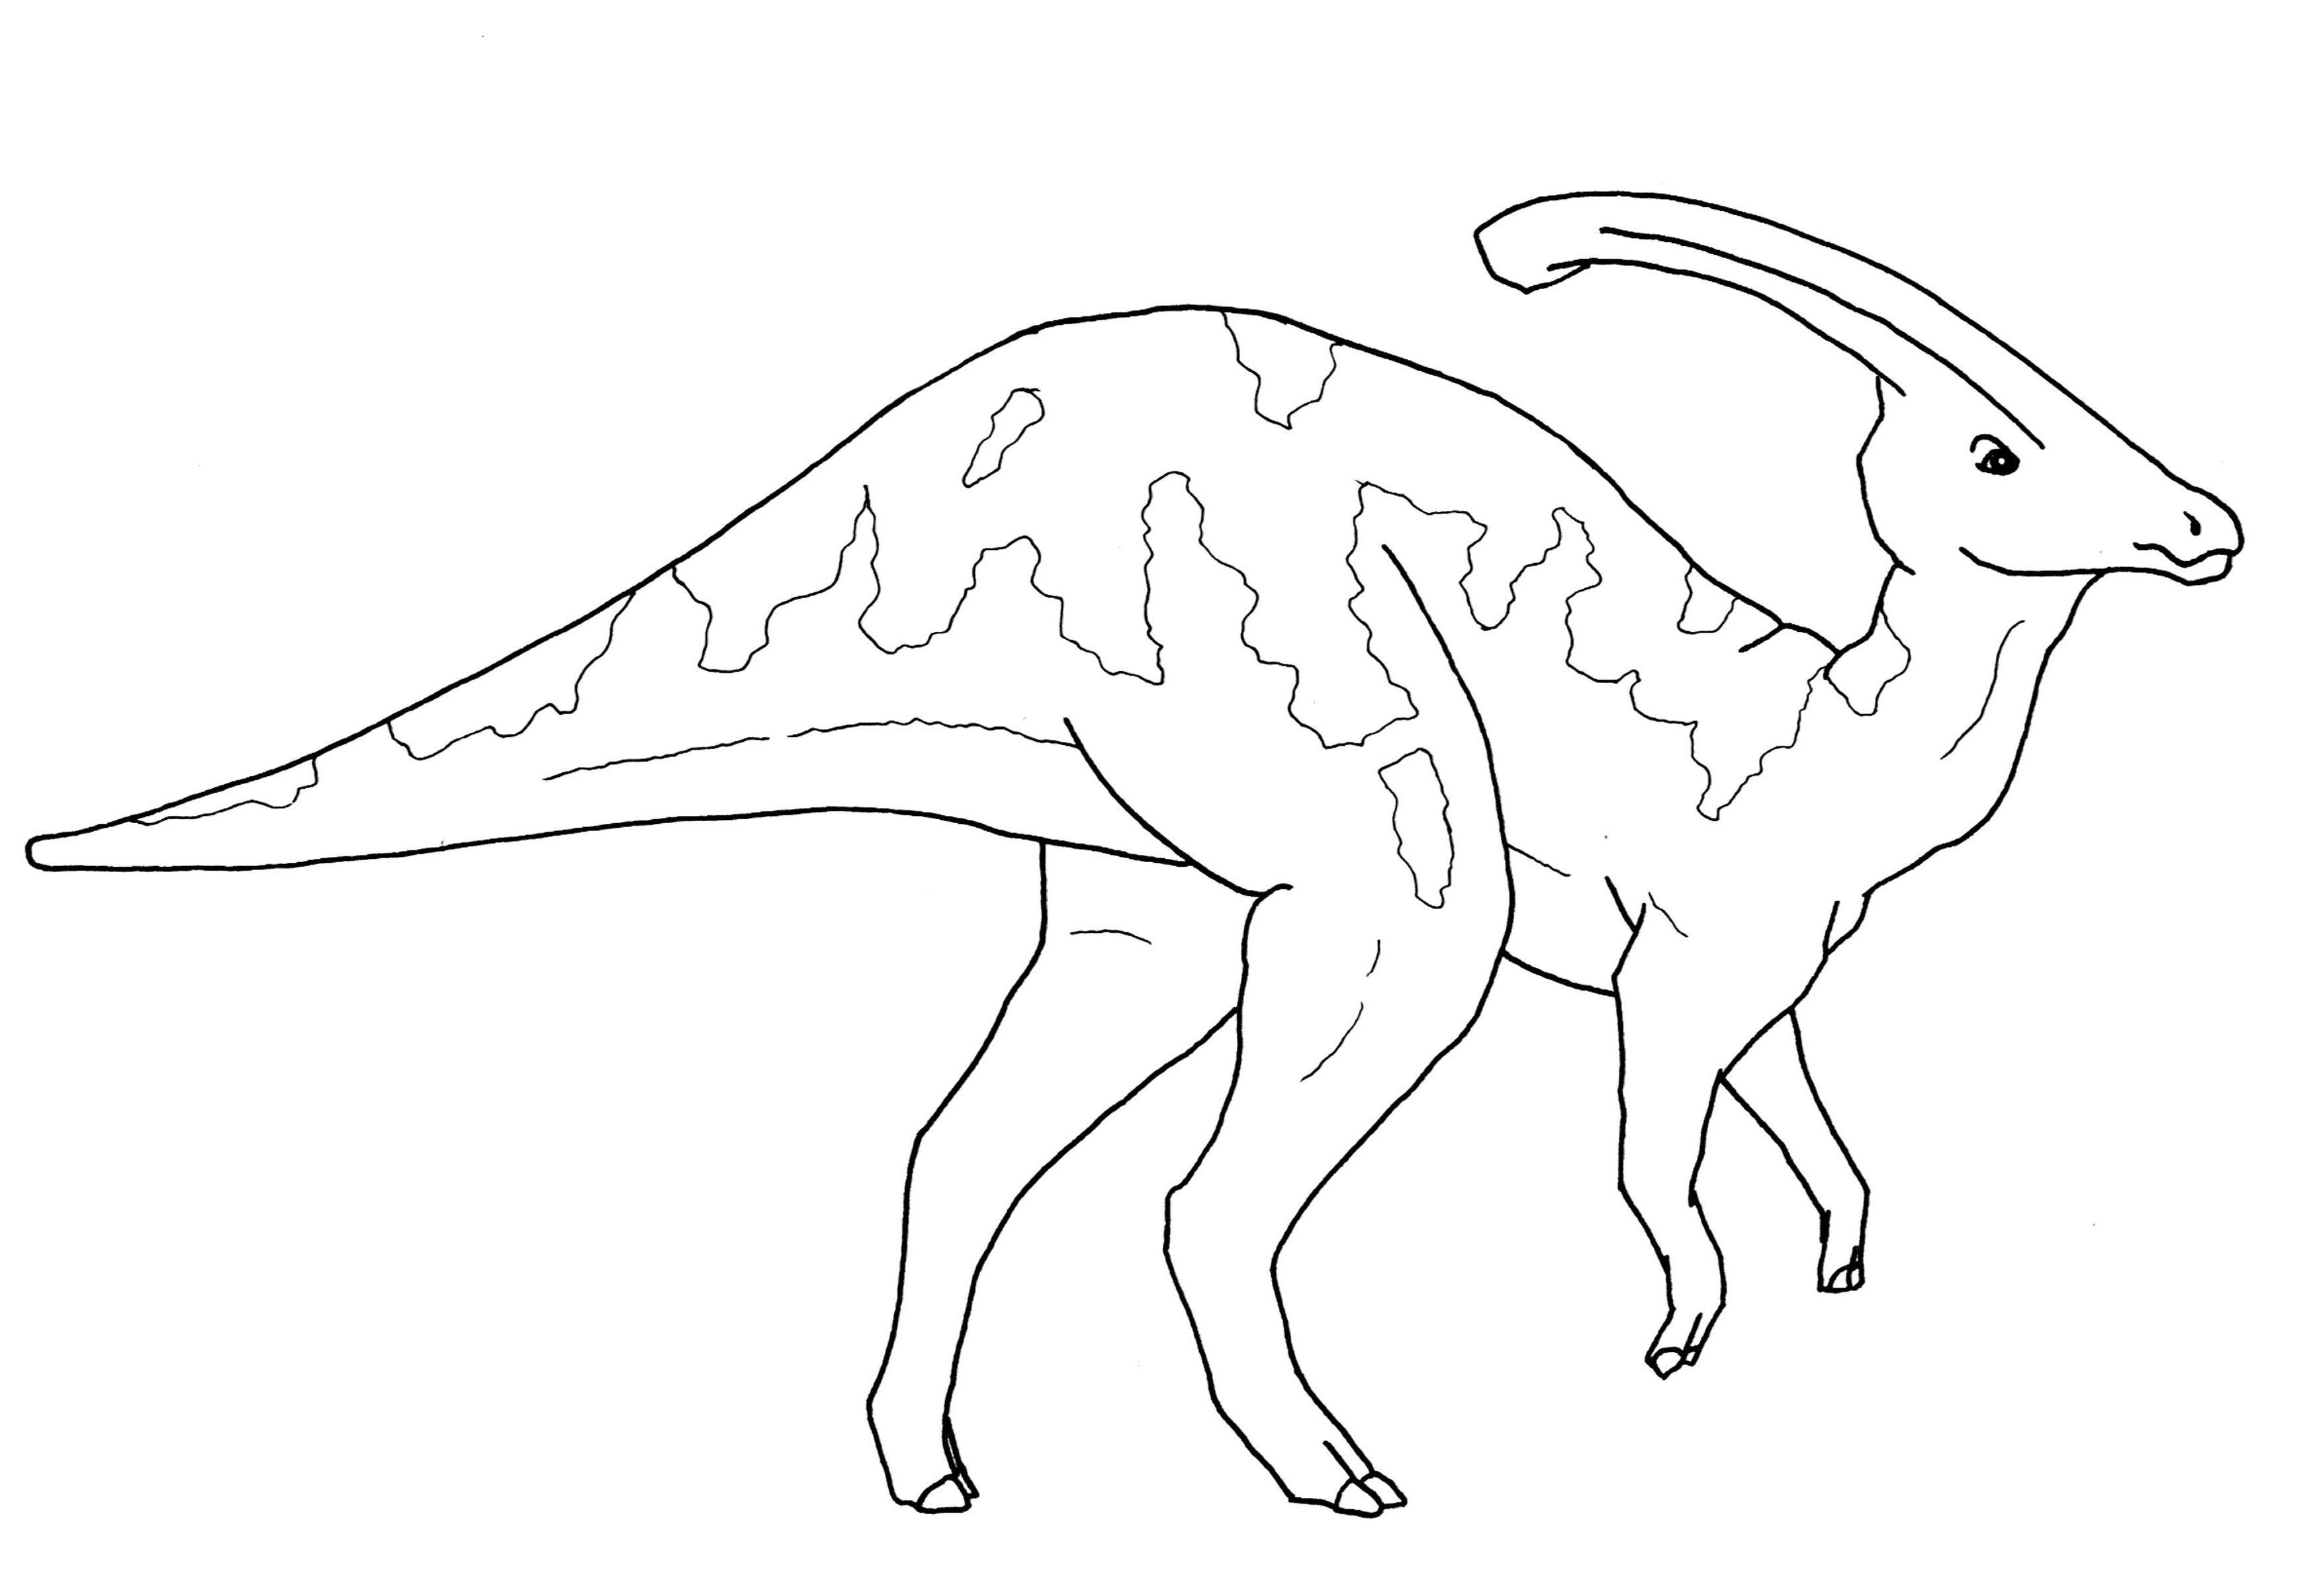 Parasaurolophus Dinosaurs